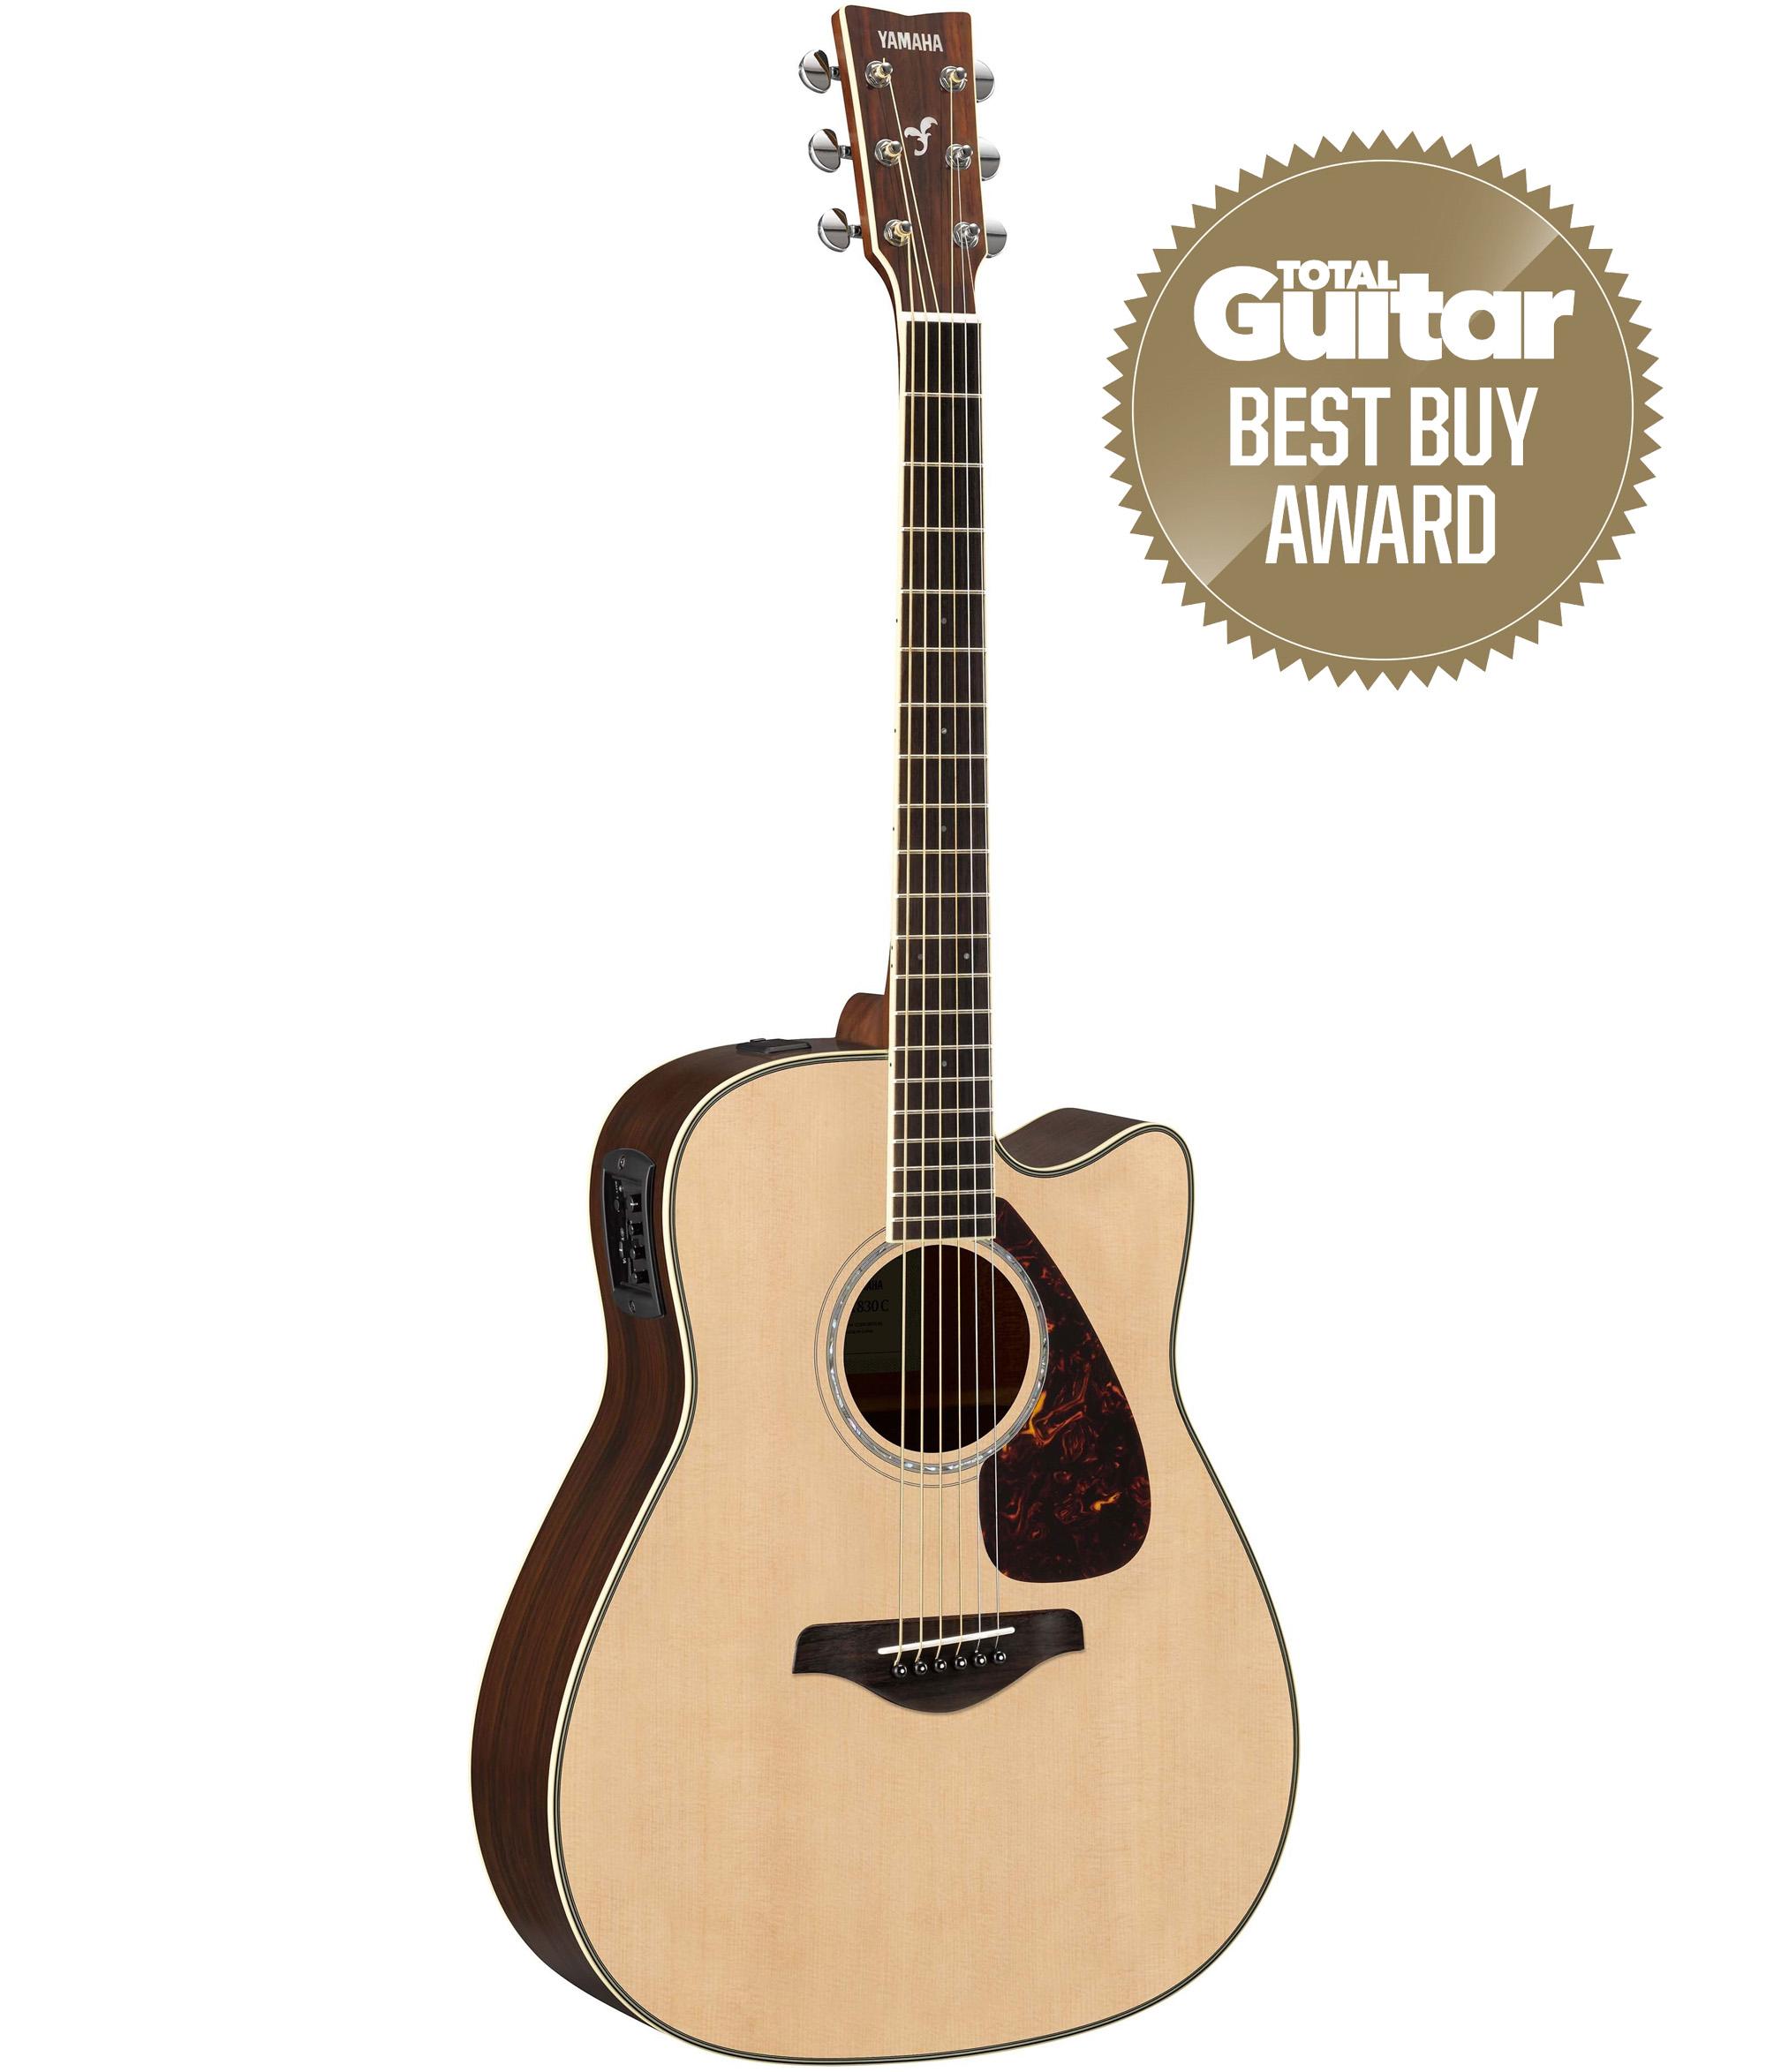 Yamaha fgx830c electro acoustic guitar natural finish for Yamaha fg830 specs